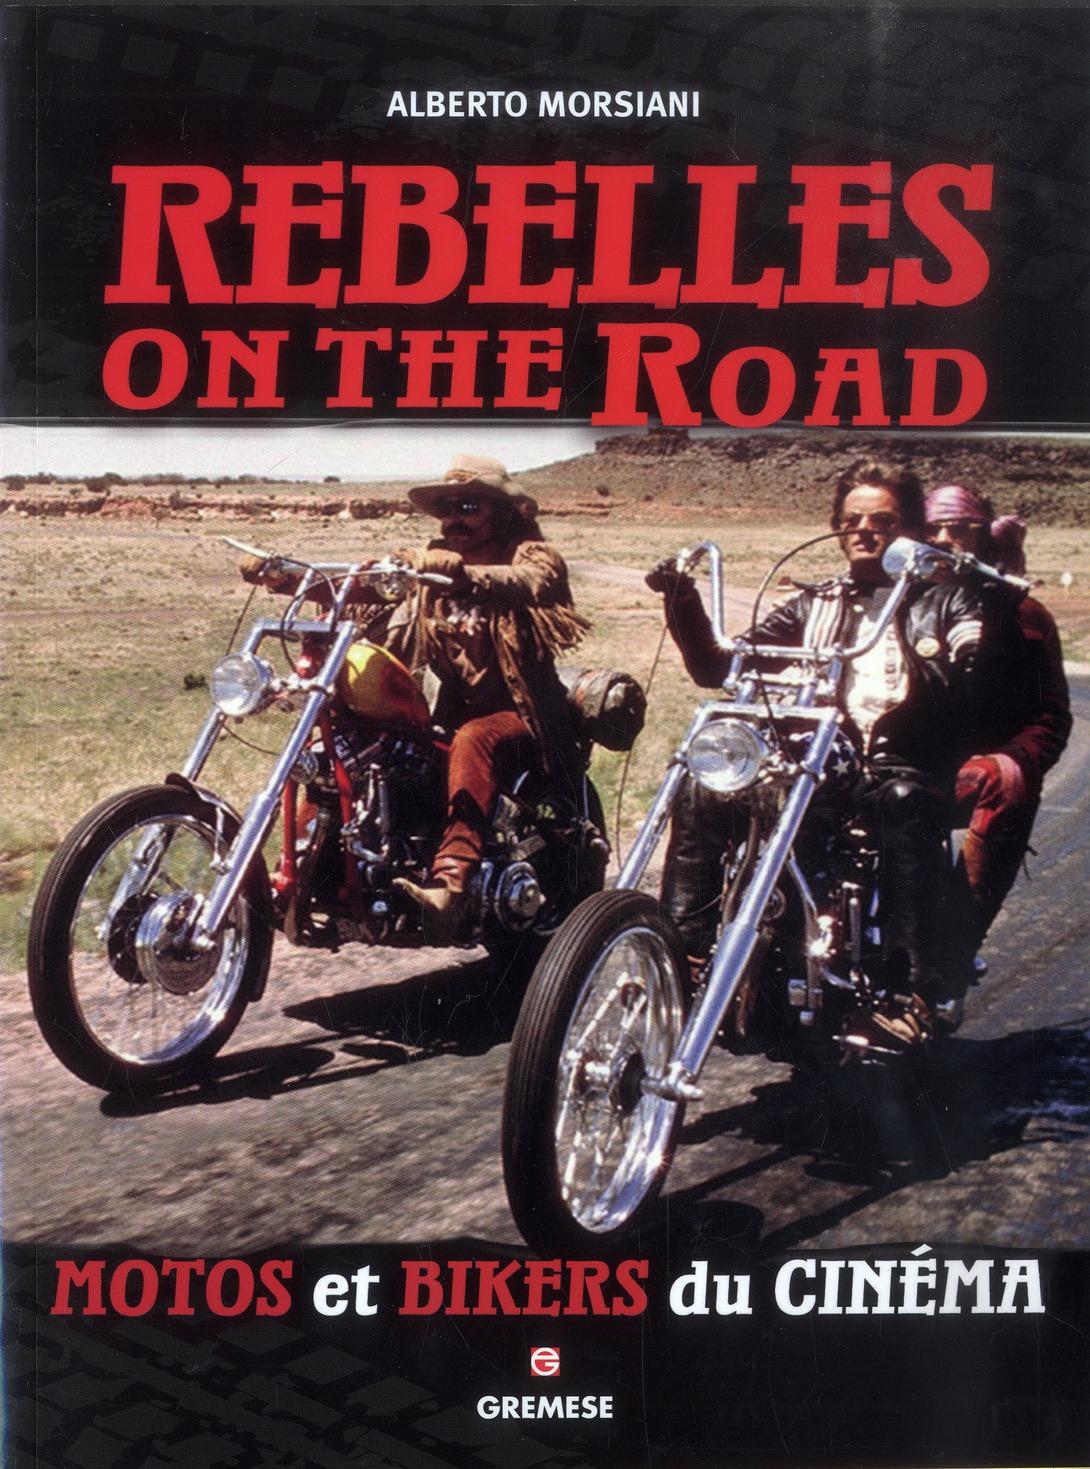 REBELLES ON THE ROAD. MOTOS ET BIKERS DU CINEMA.